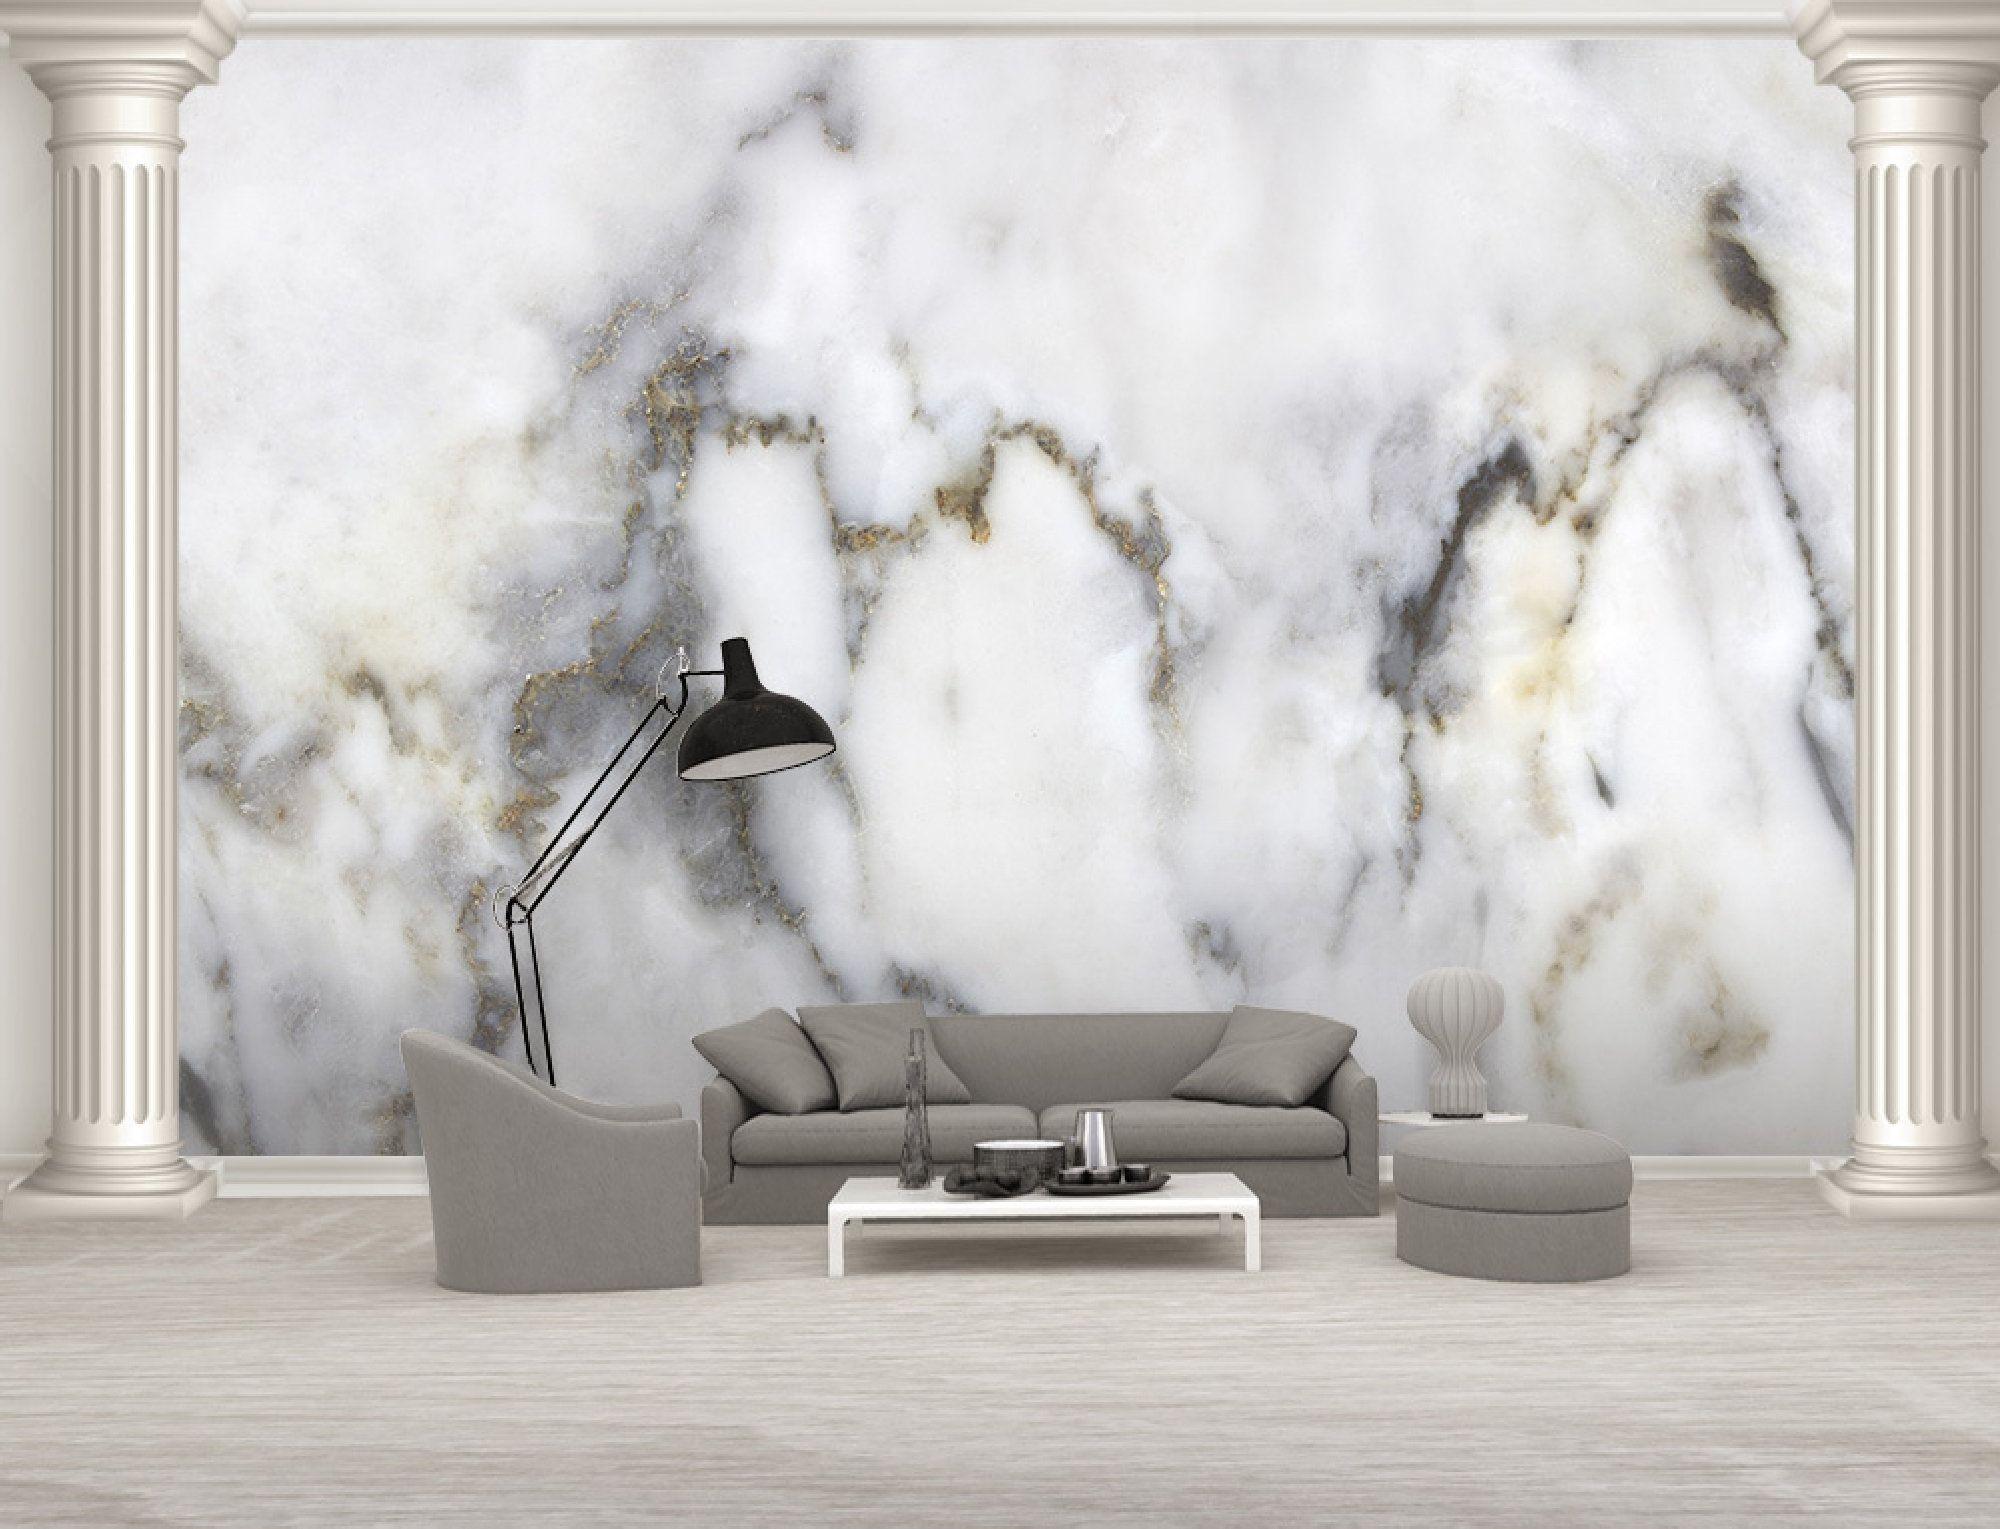 Marble Wallpaper Modern Beautiful Wall Mural For Living Room Etsy In 2020 Beautiful Wall Wall Murals Living Room Bedroom